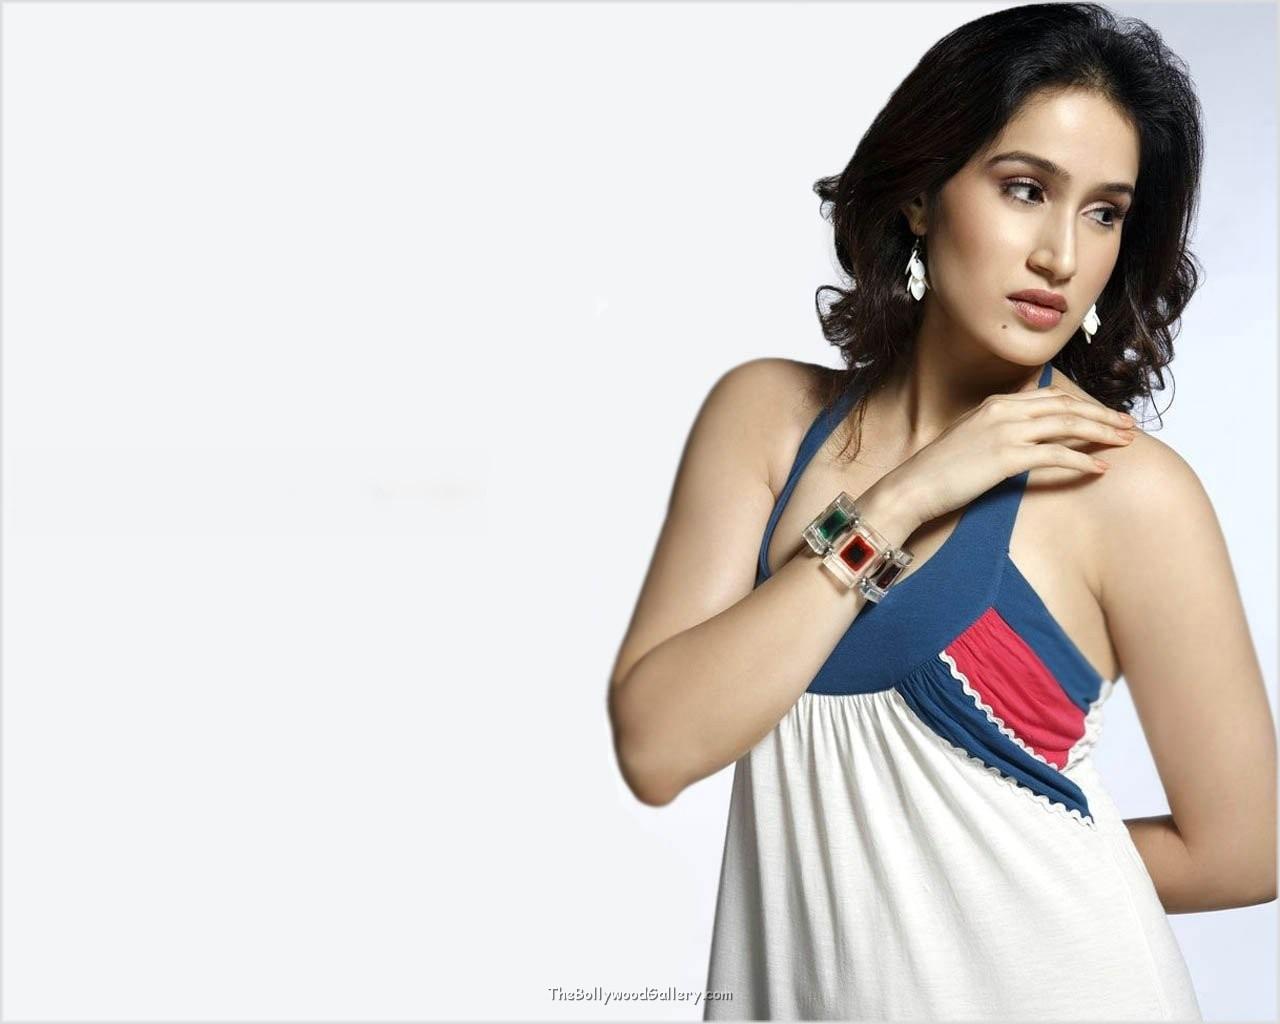 Sagarika Ghatge Bollywood Actress Hot Wallpapers